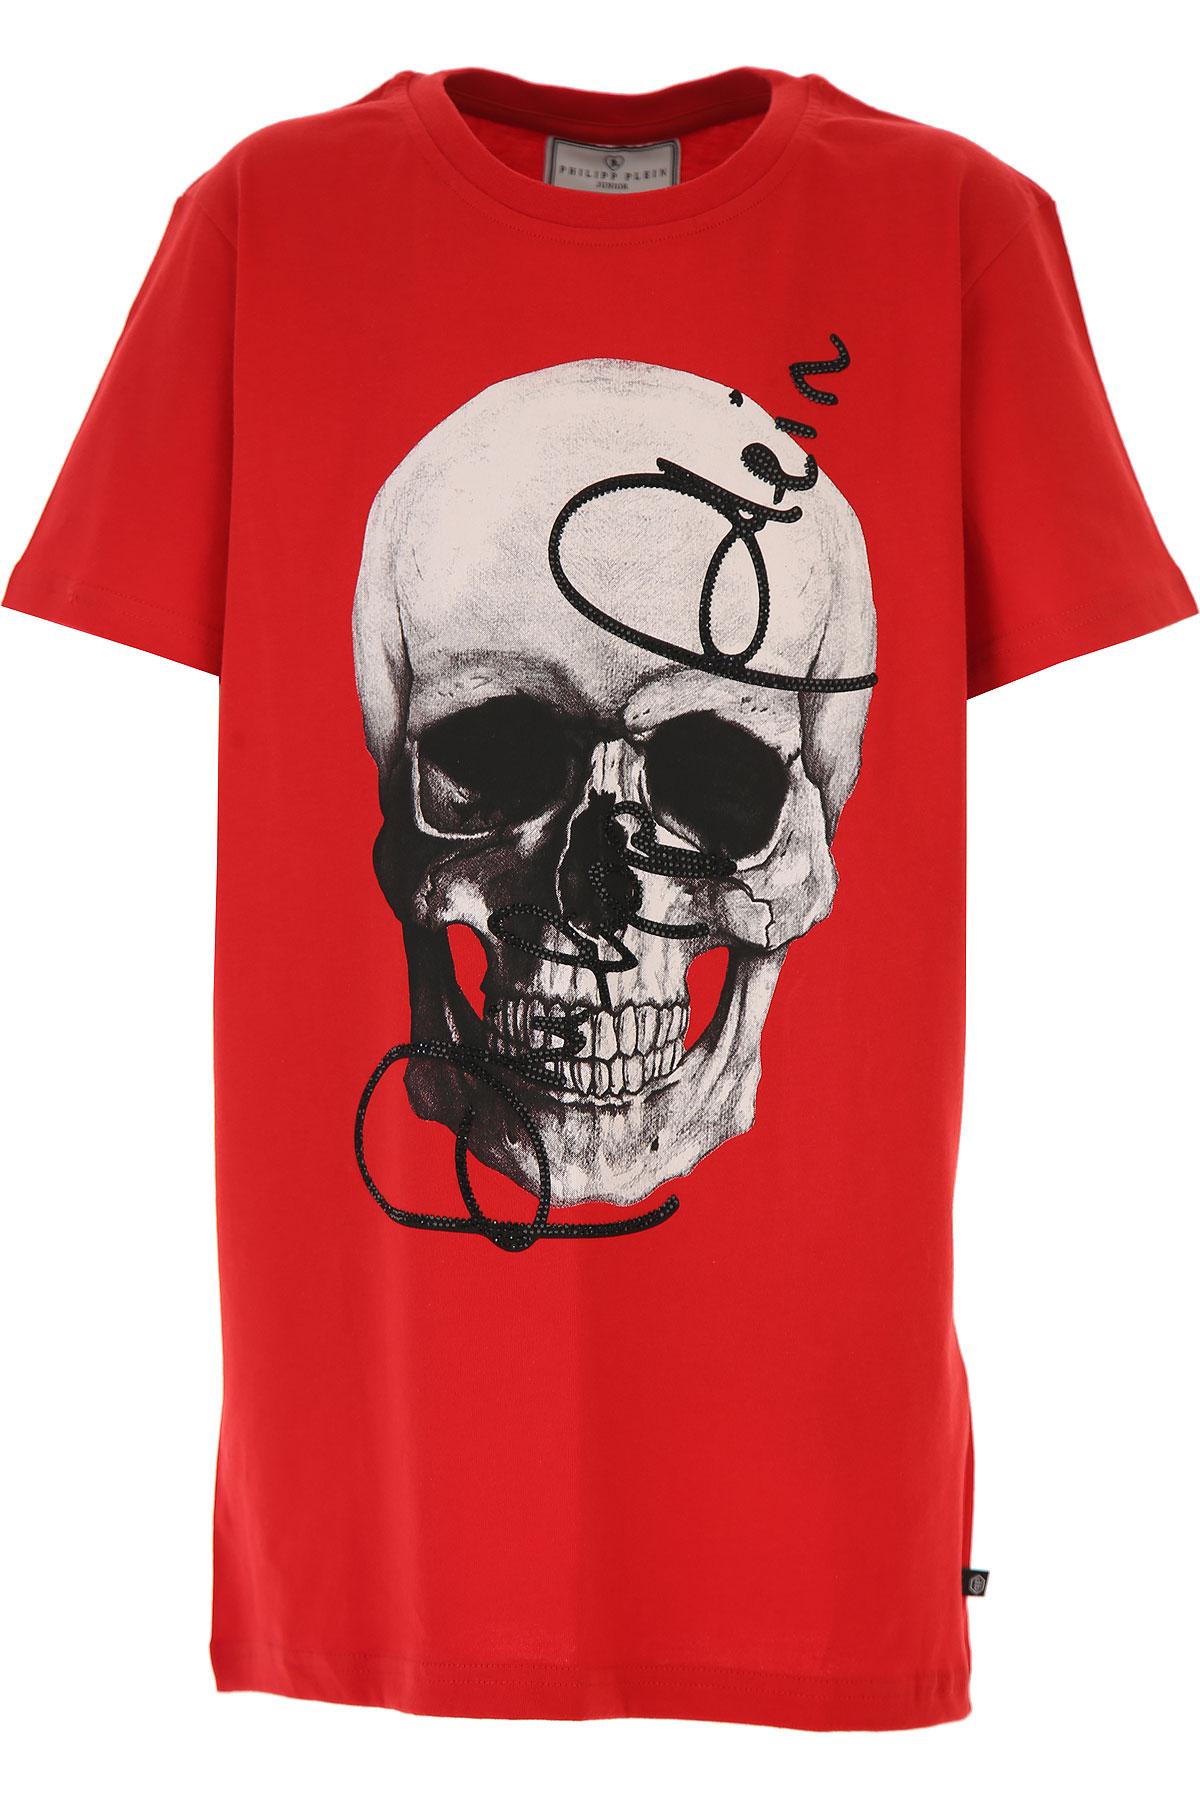 Philipp Plein Kids T-Shirt for Boys On Sale, Red, Cotton, 2019, 14Y 16Y